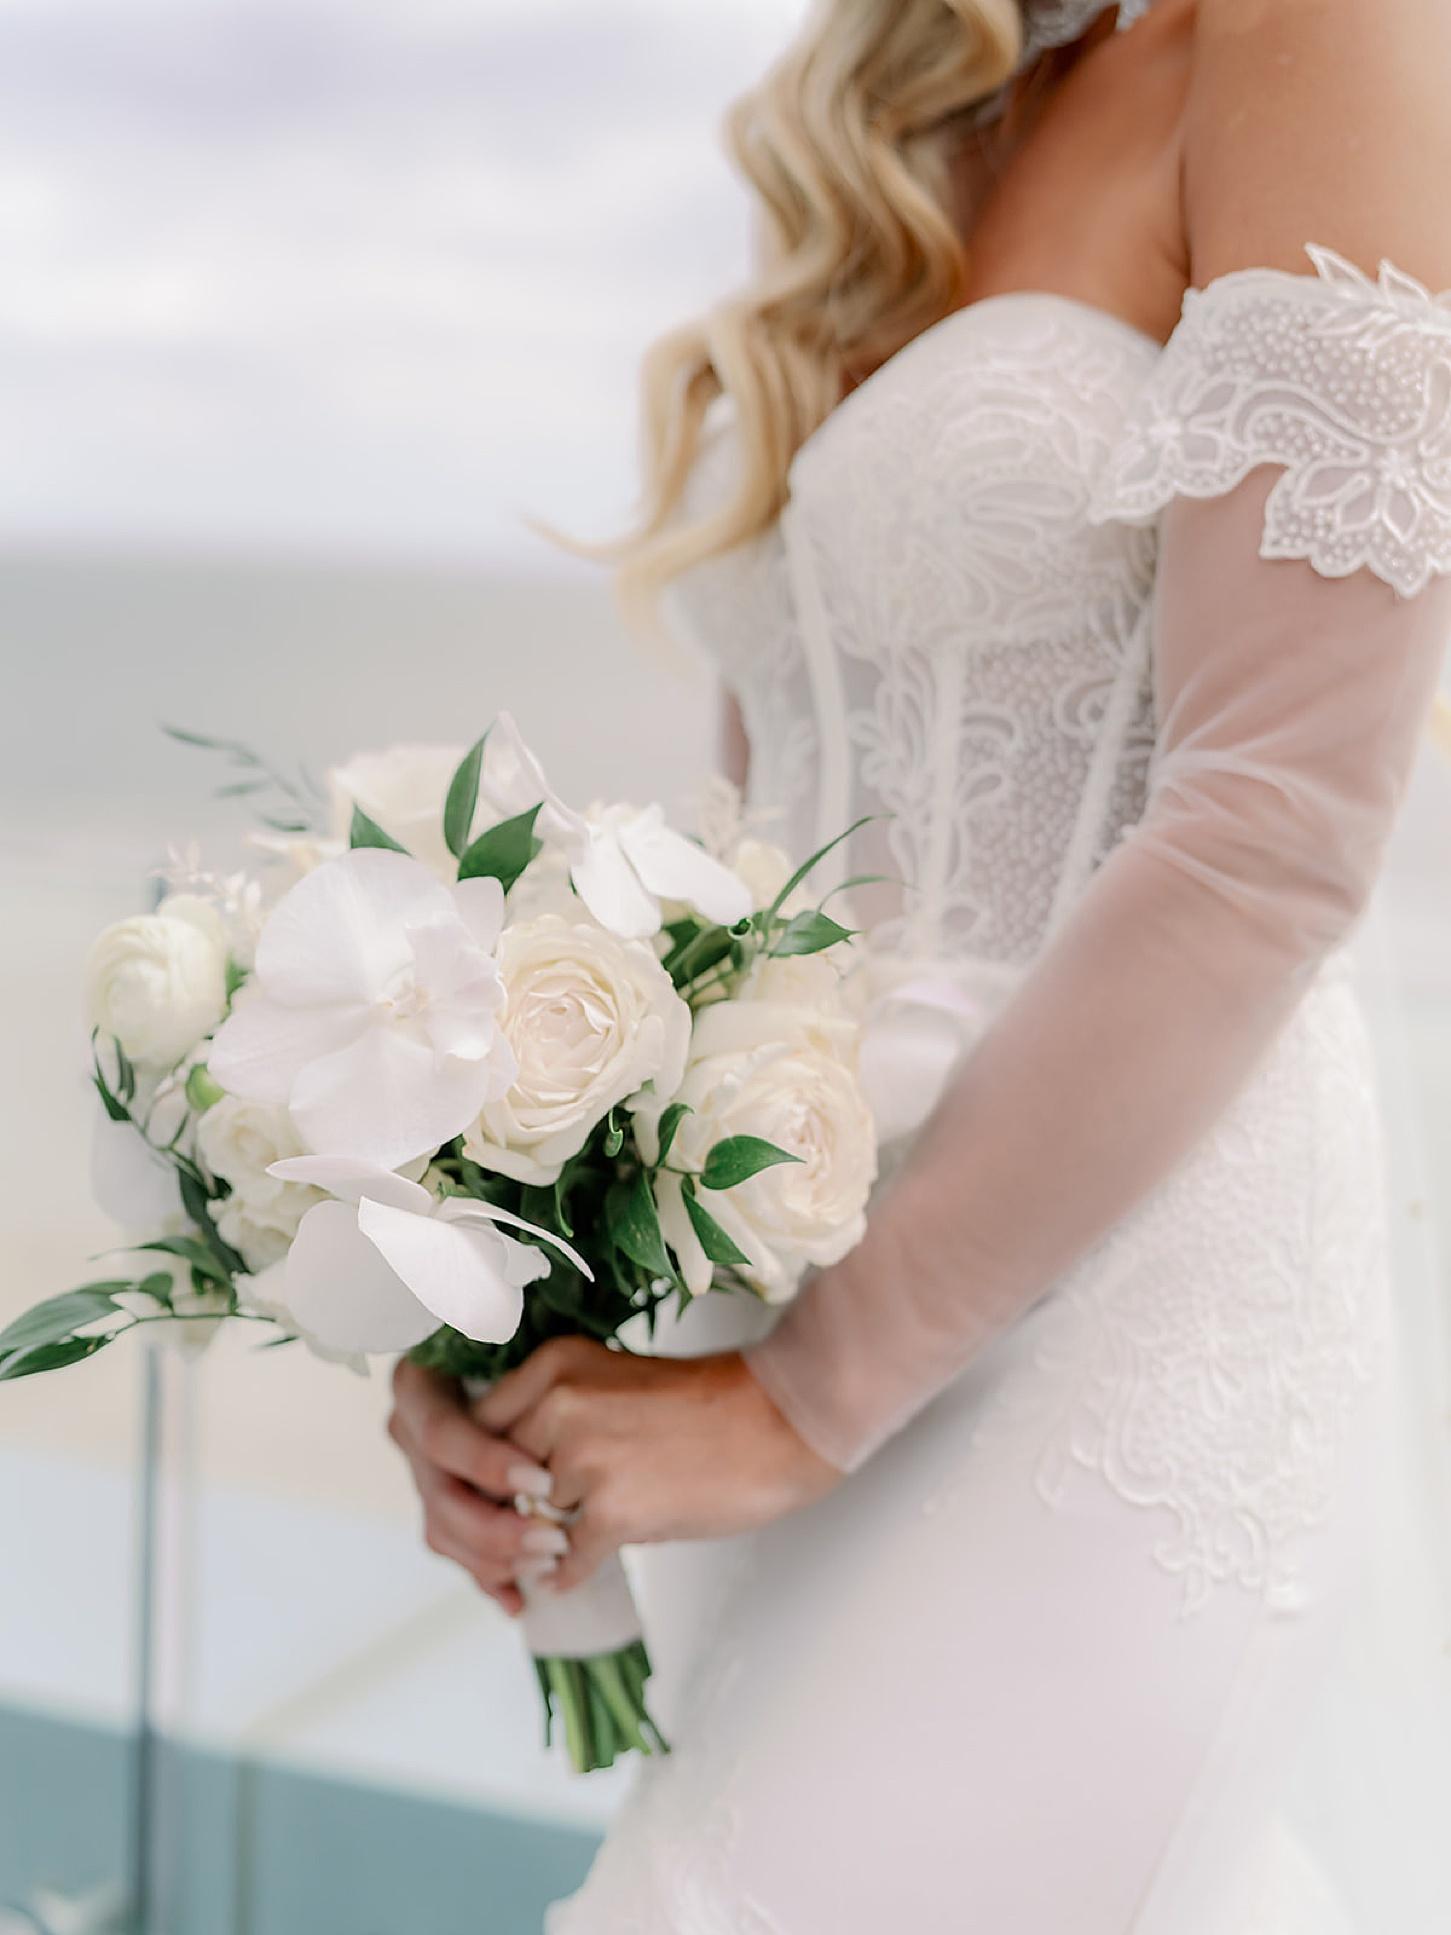 Atlantic City Wedding Photography Studio by Magdalena Studios Lexy Cha 0030